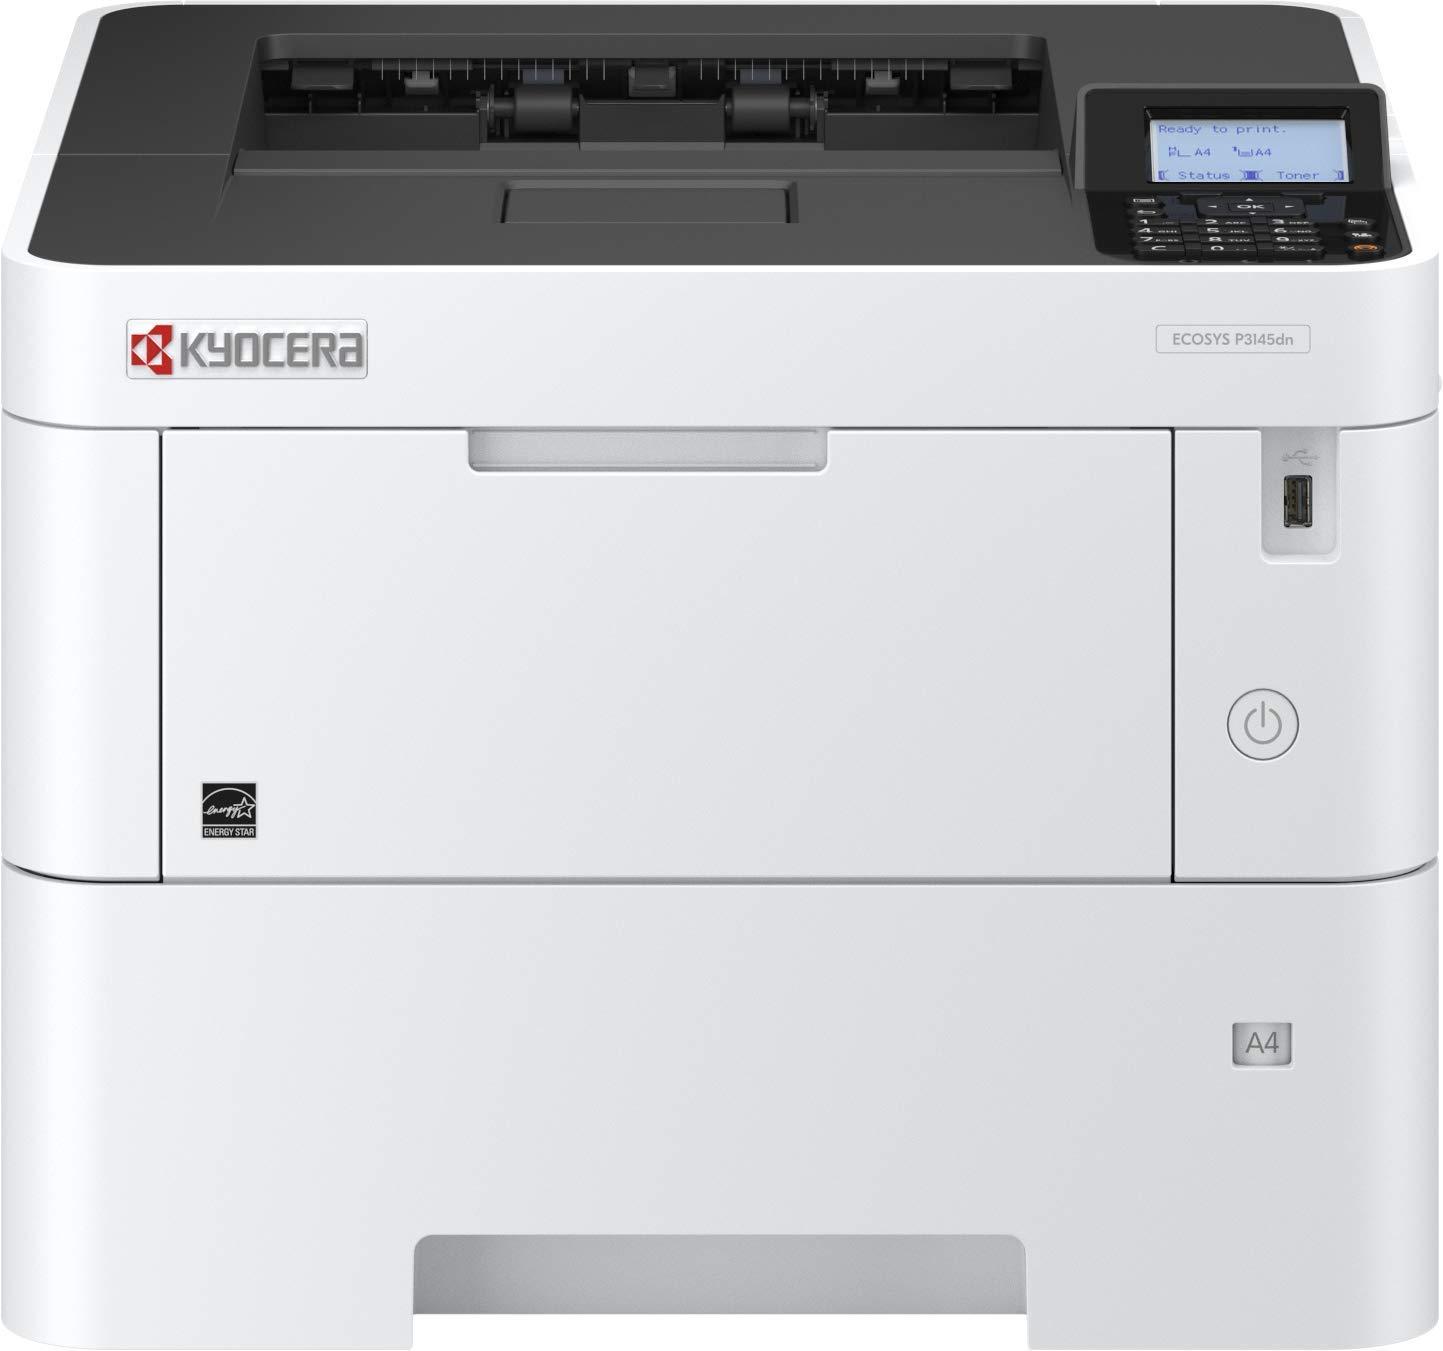 Laser Printers KYOCERA ECOSYS P3145dn Printer